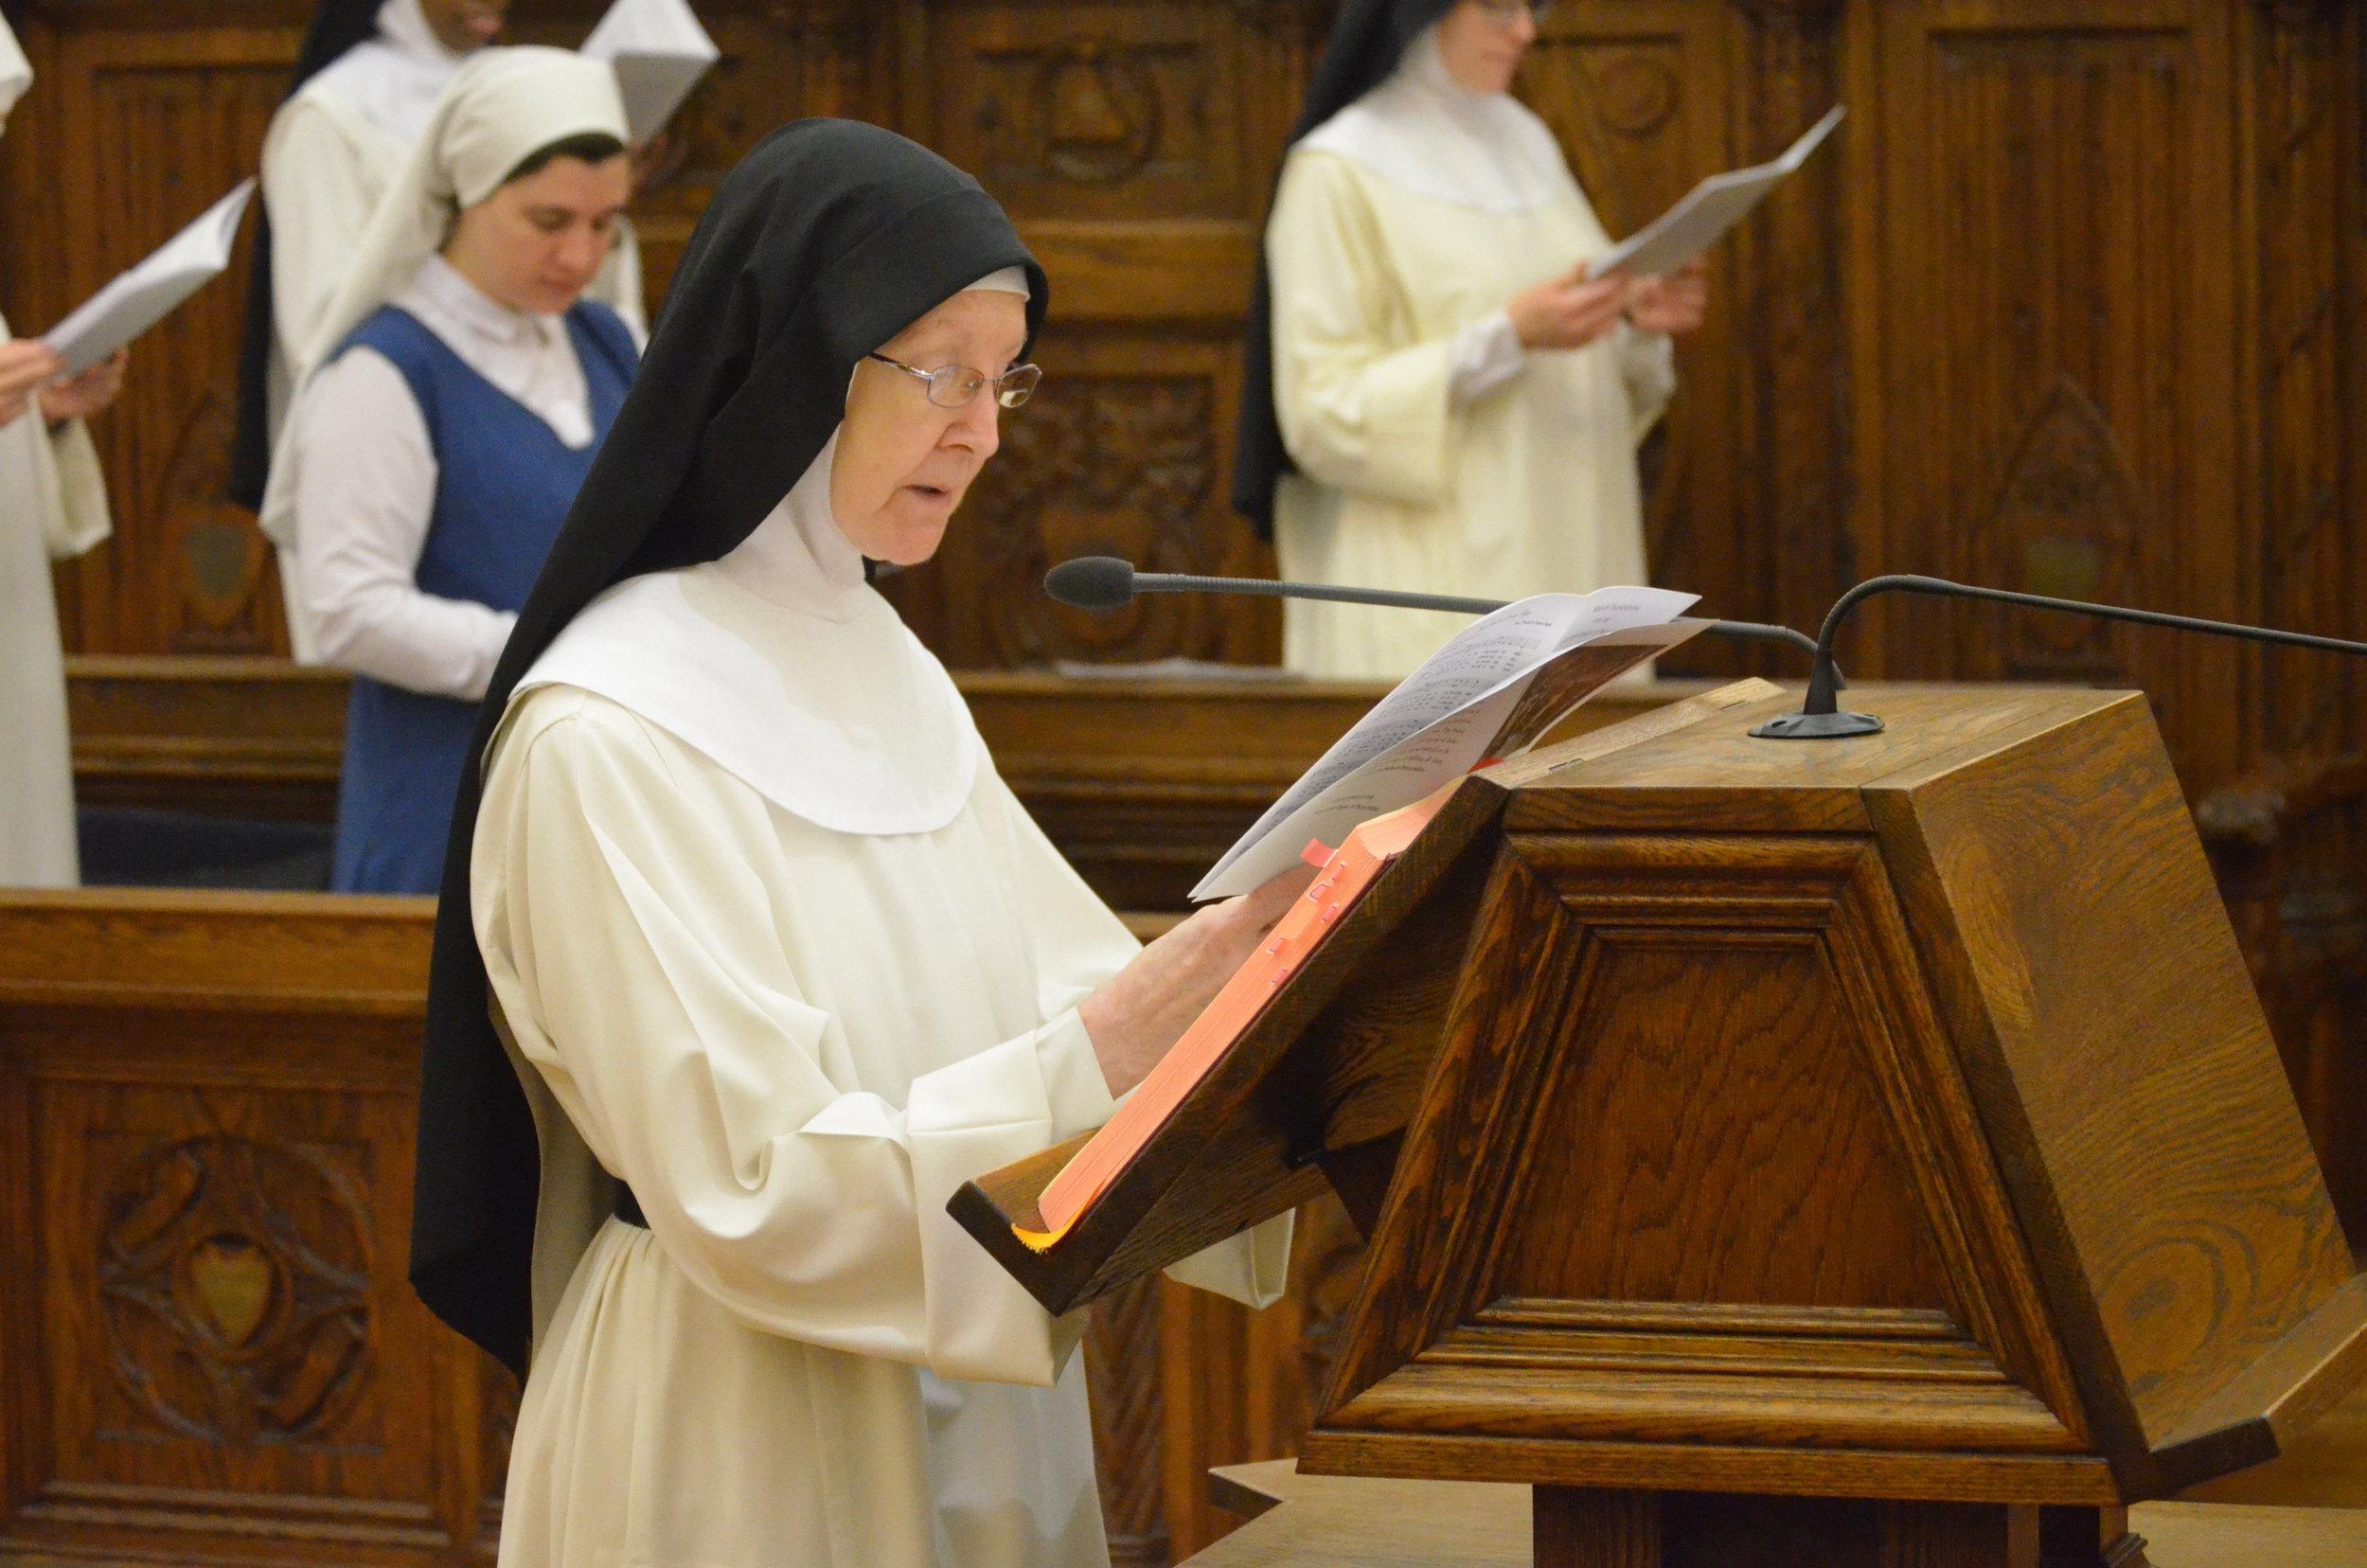 Sr. Mary Amata reads an intercession